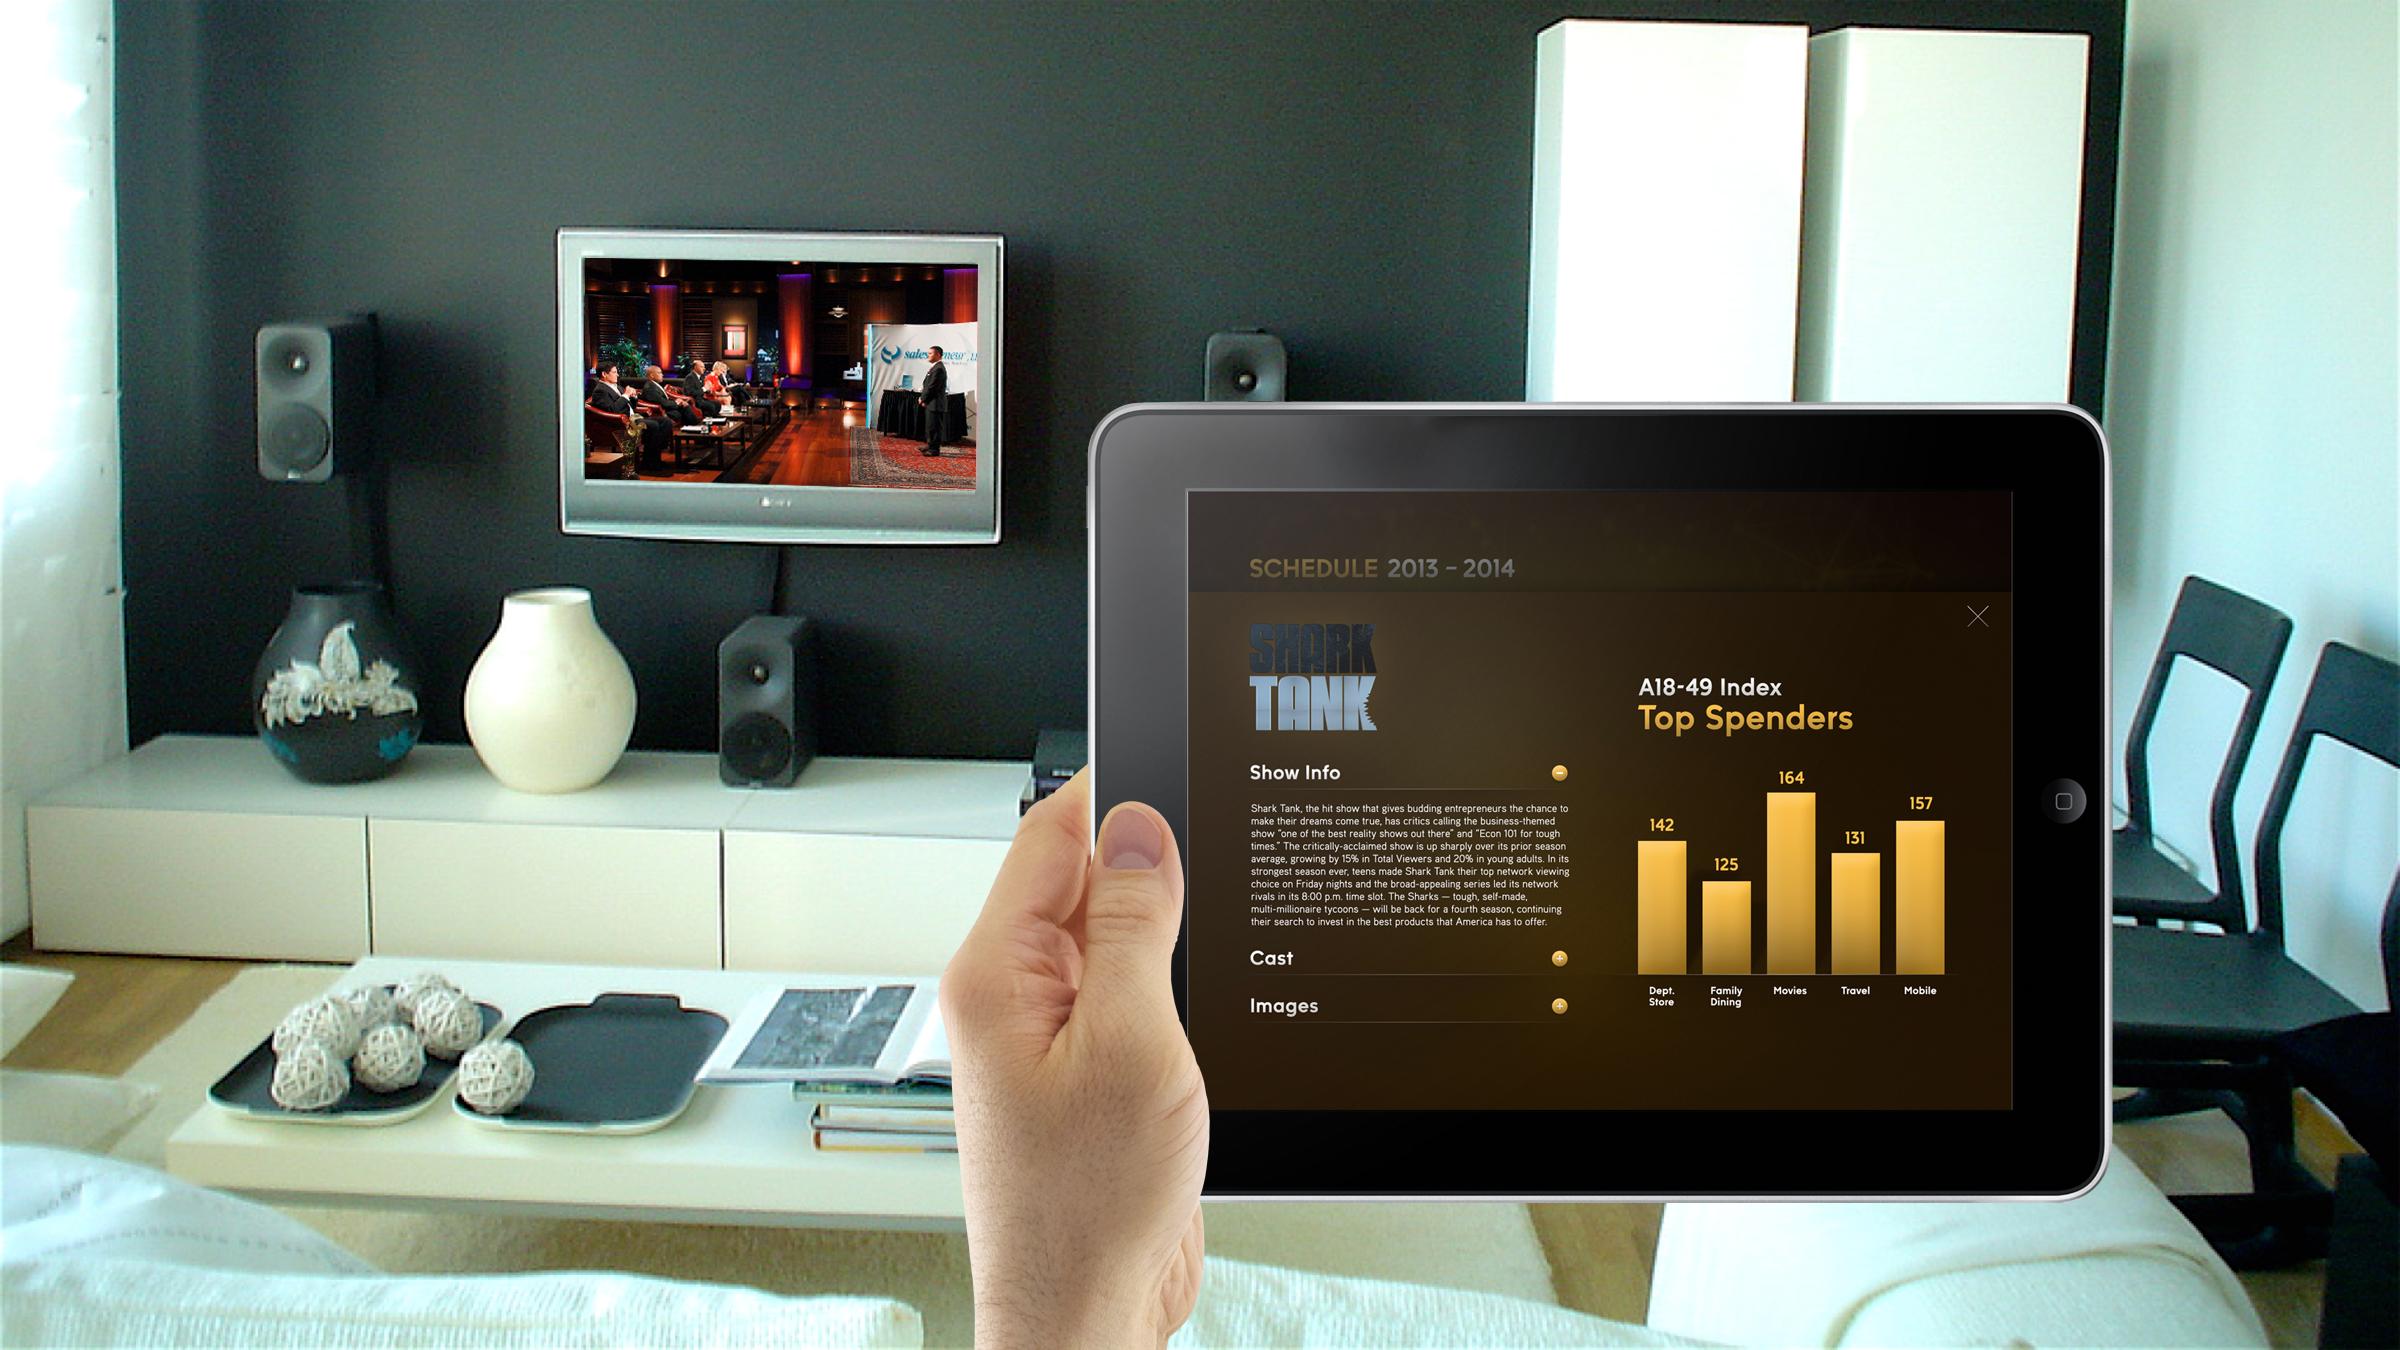 iPad_In-Situ_View_0002_Layer Comp 3.jpg